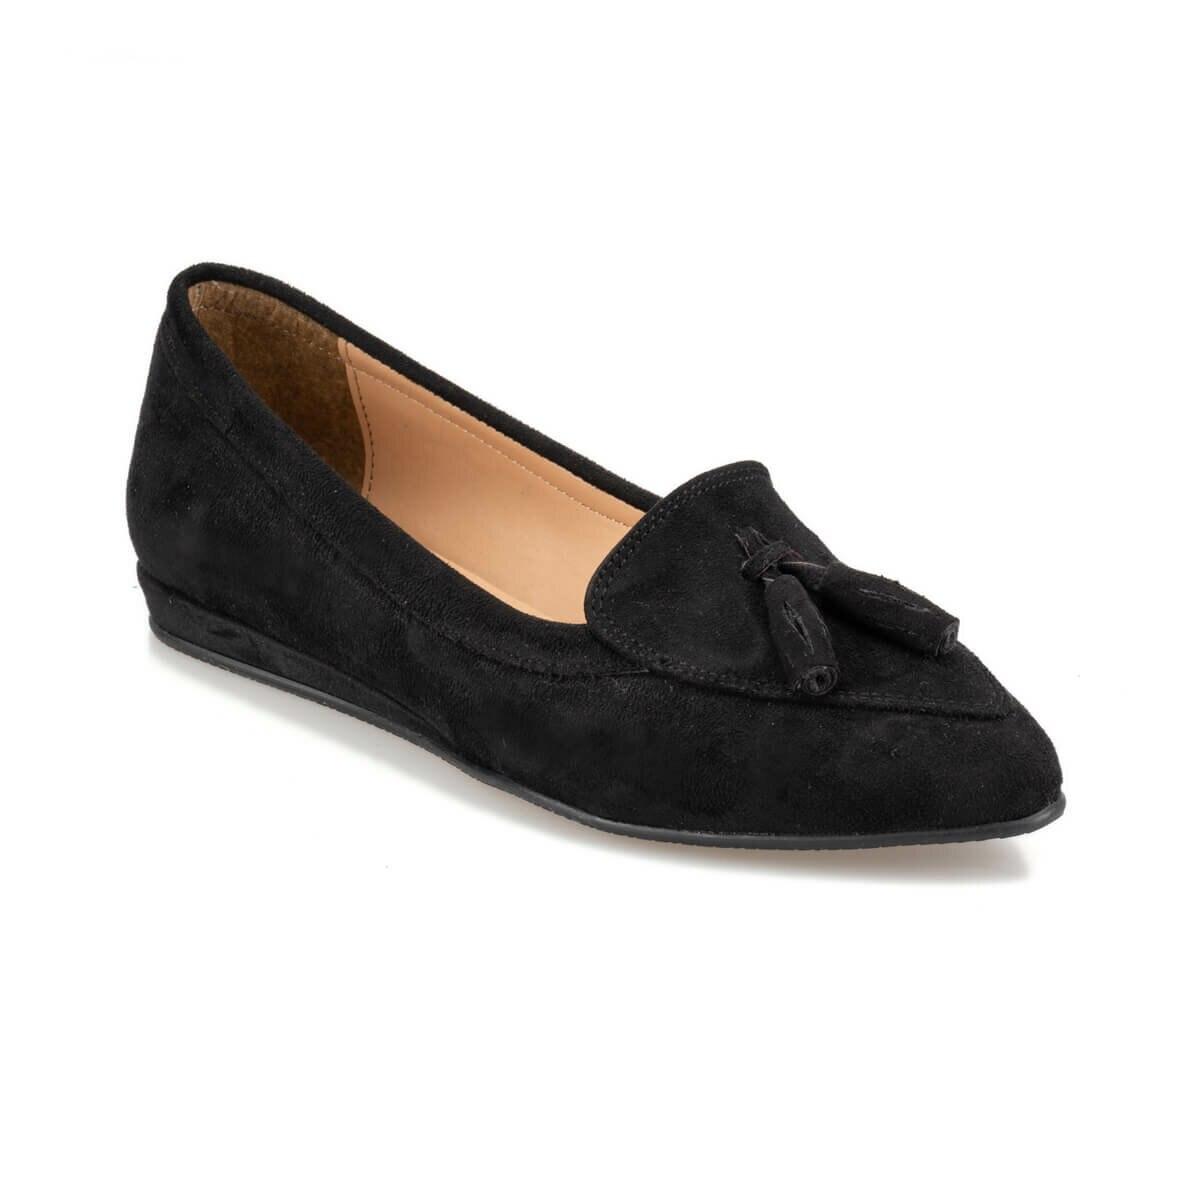 FLO 92.314097SZ Black Women Loafer Shoes Polaris